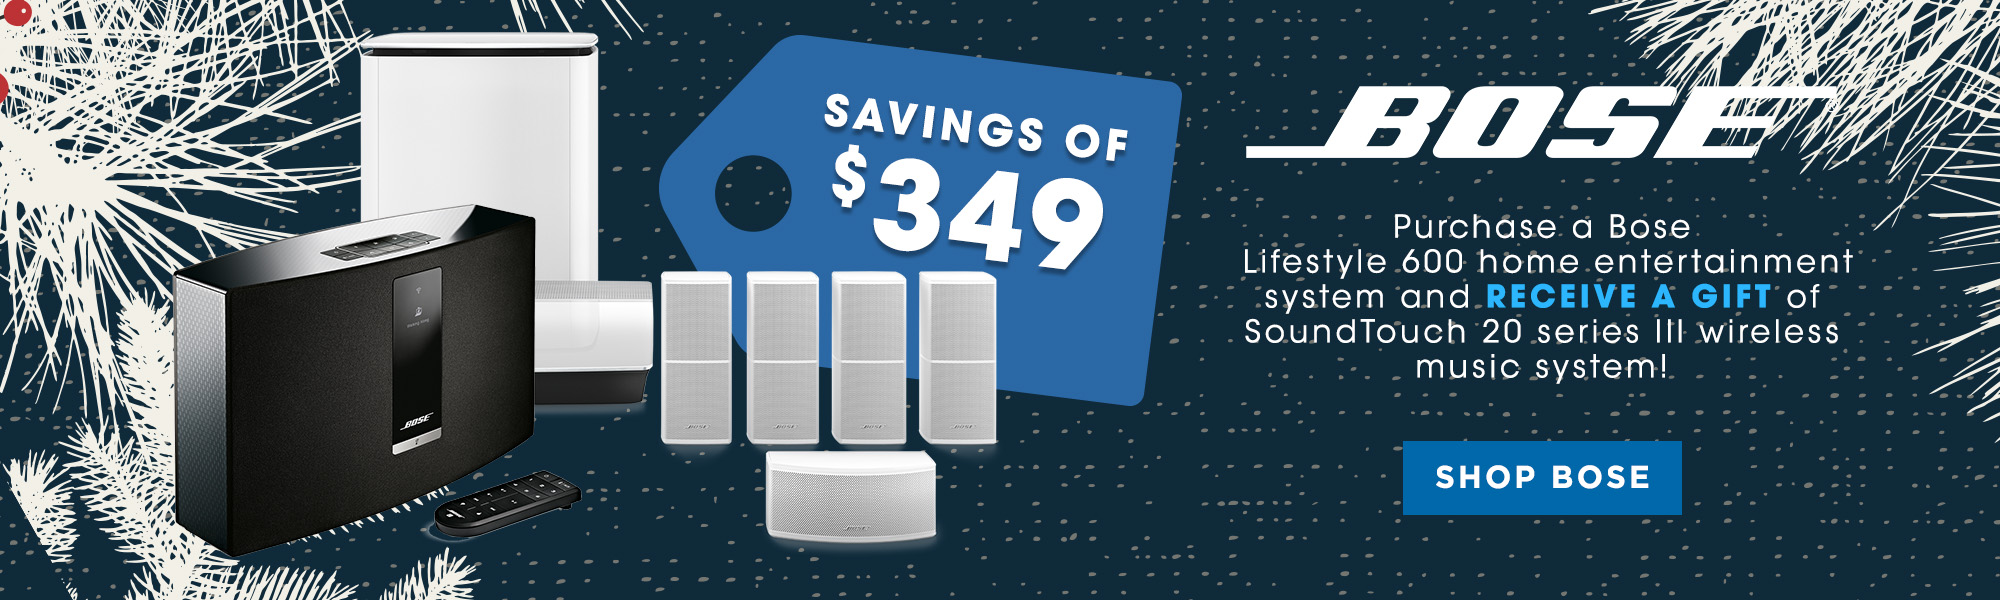 Bose November Savings